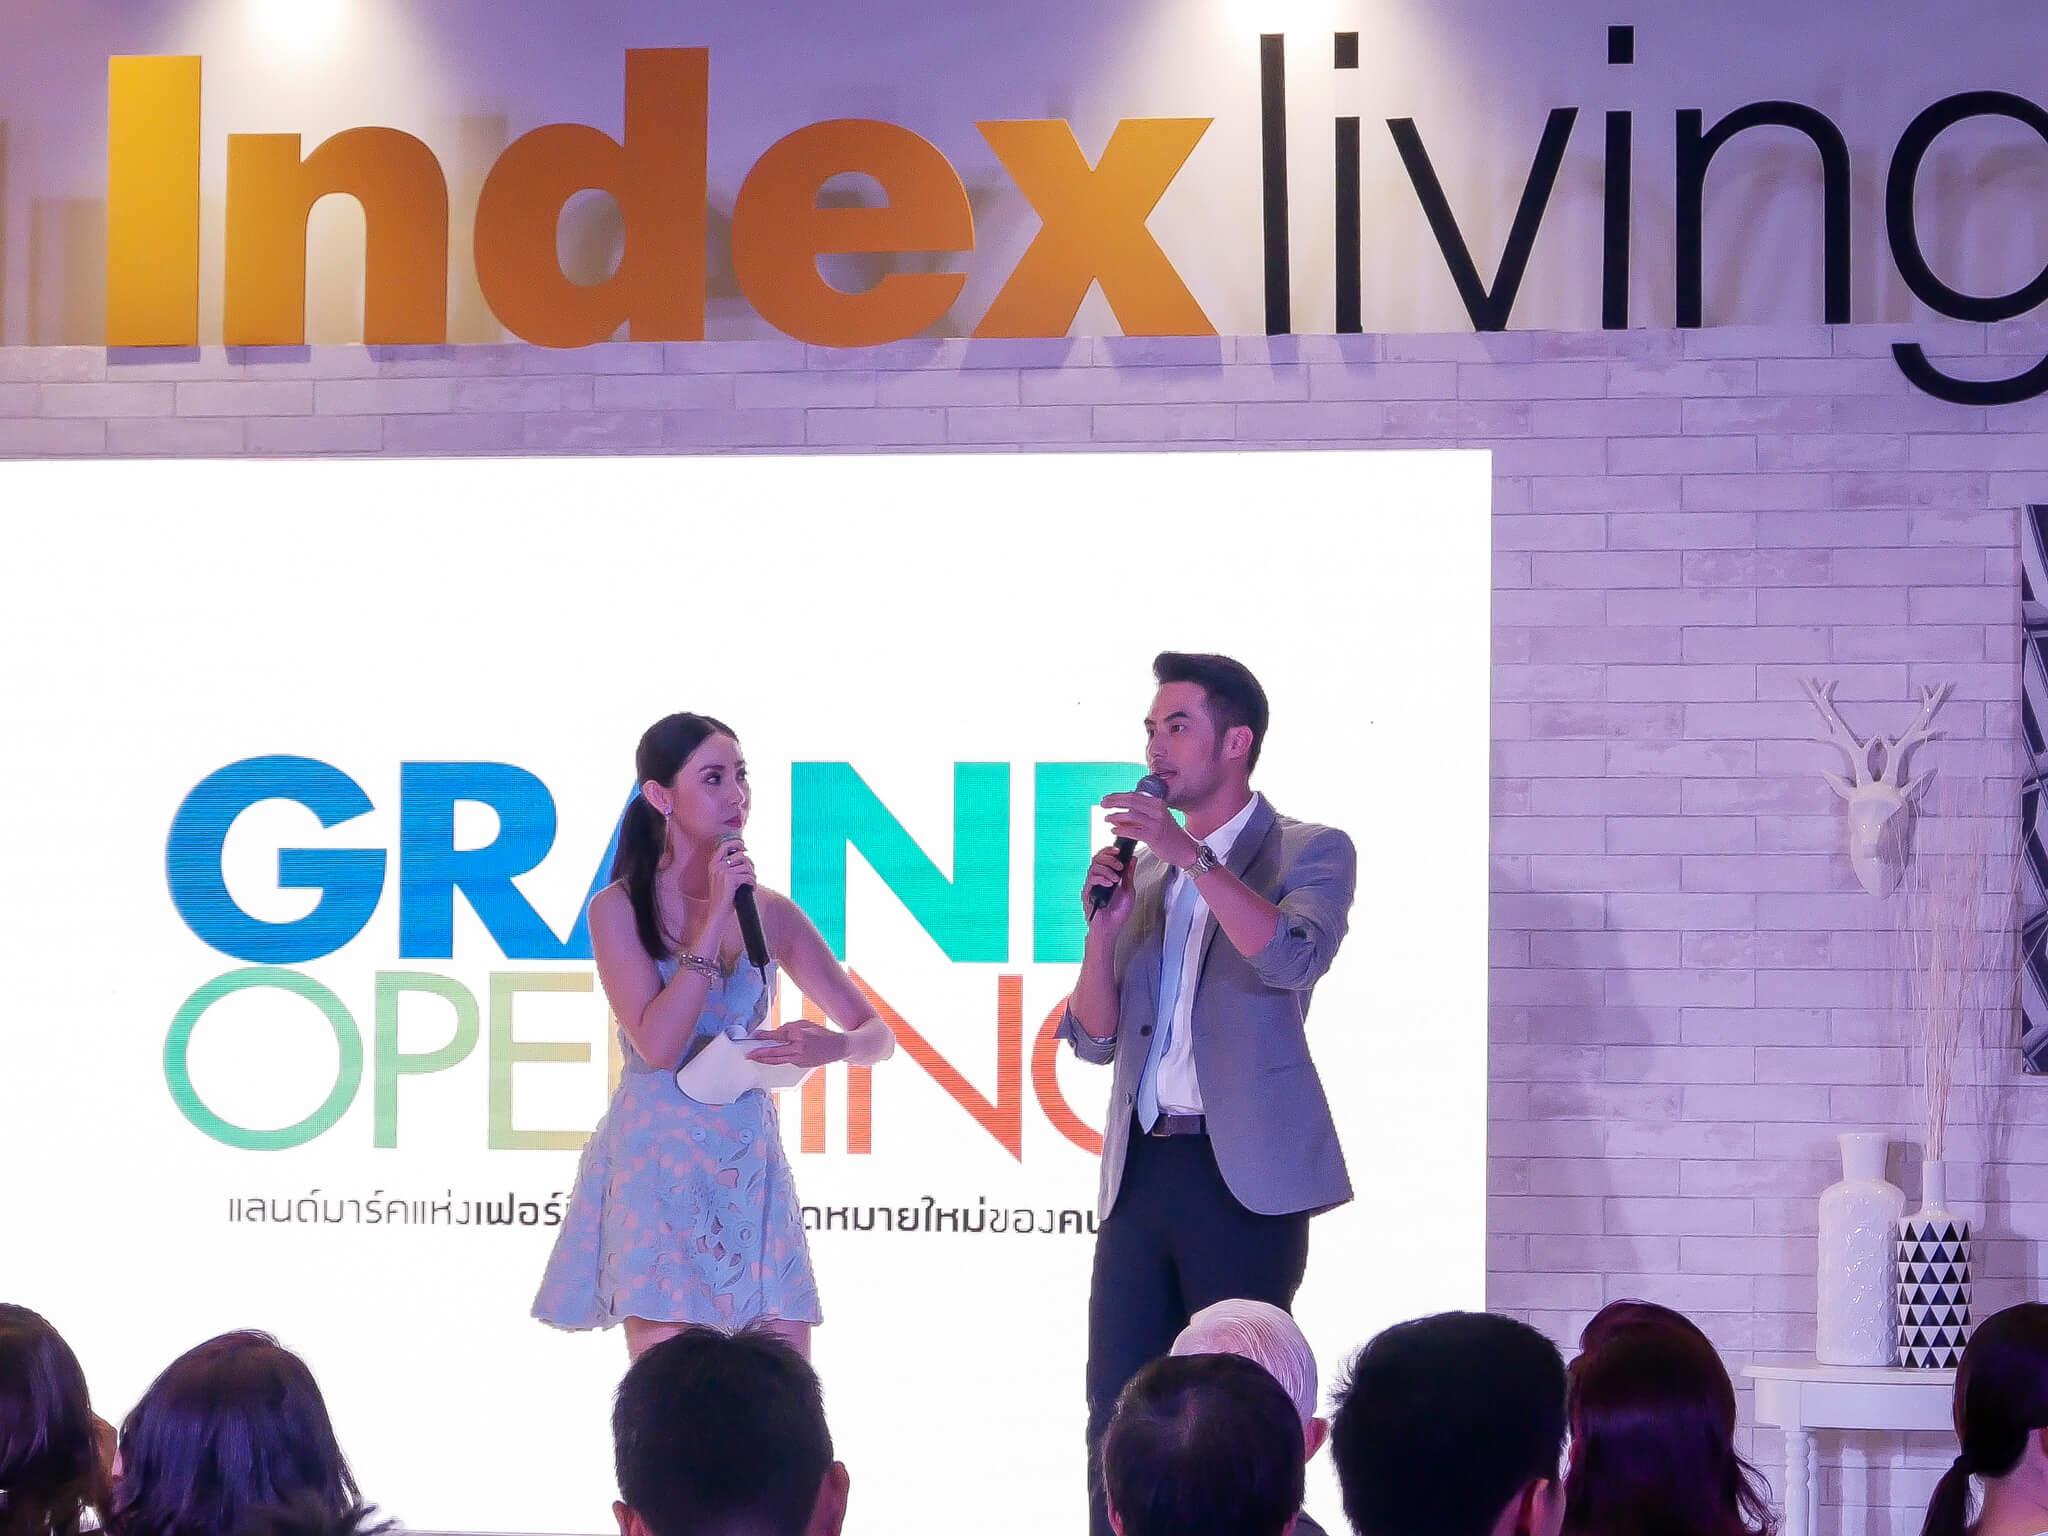 "Index Living Mall พระราม 2 เปิดใหม่ไม่ใช่แค่ ""ร้านเฟอร์นิเจอร์"" แต่เป็น ""Lifestyle Destination"" แนว URBAN STYLISH 18 - Index Living Mall (อินเด็กซ์ ลิฟวิ่งมอลล์)"